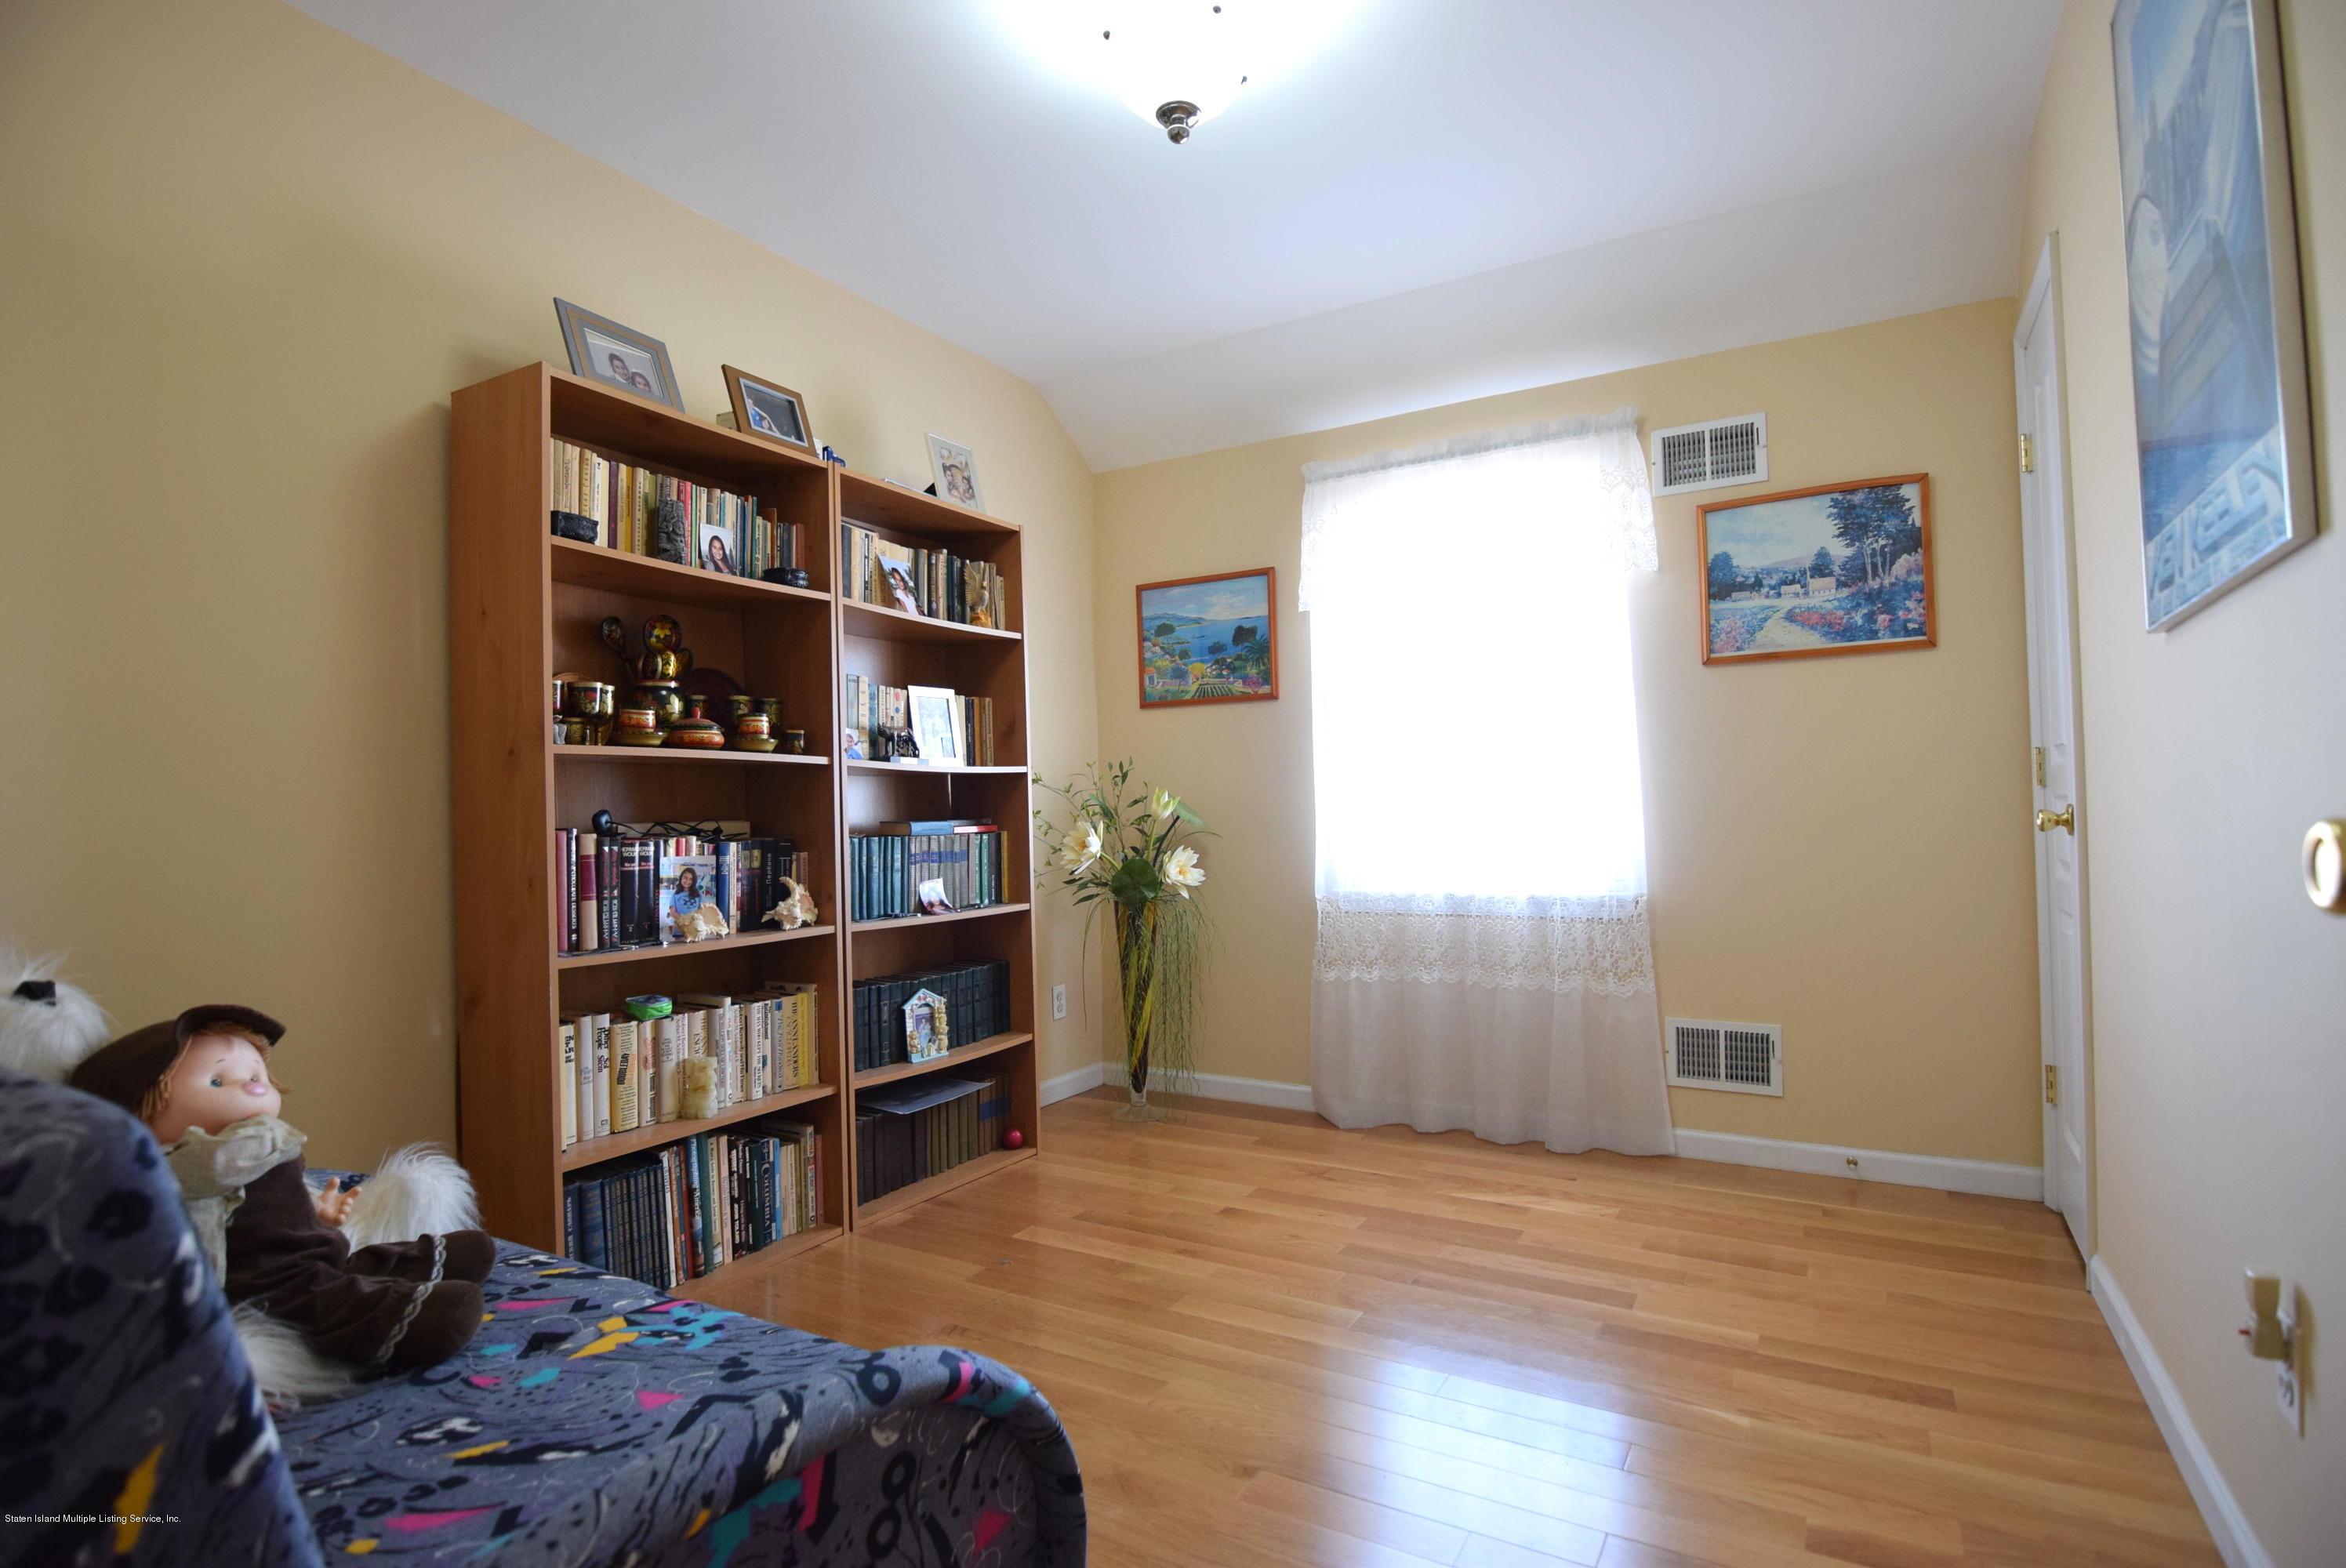 Single Family - Semi-Attached 15 Erwin Court  Staten Island, NY 10306, MLS-1126740-9